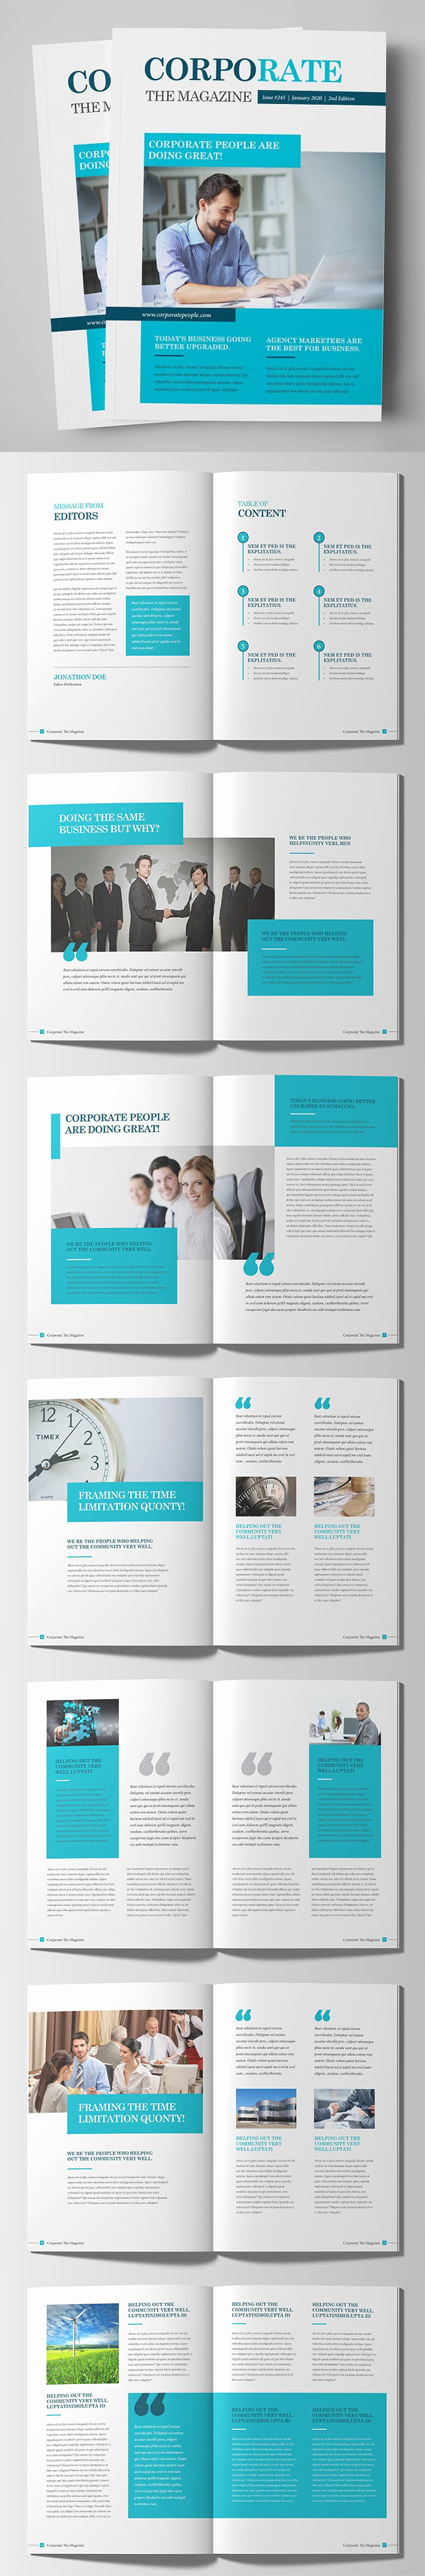 Corporate Business Magazine Brochure Template